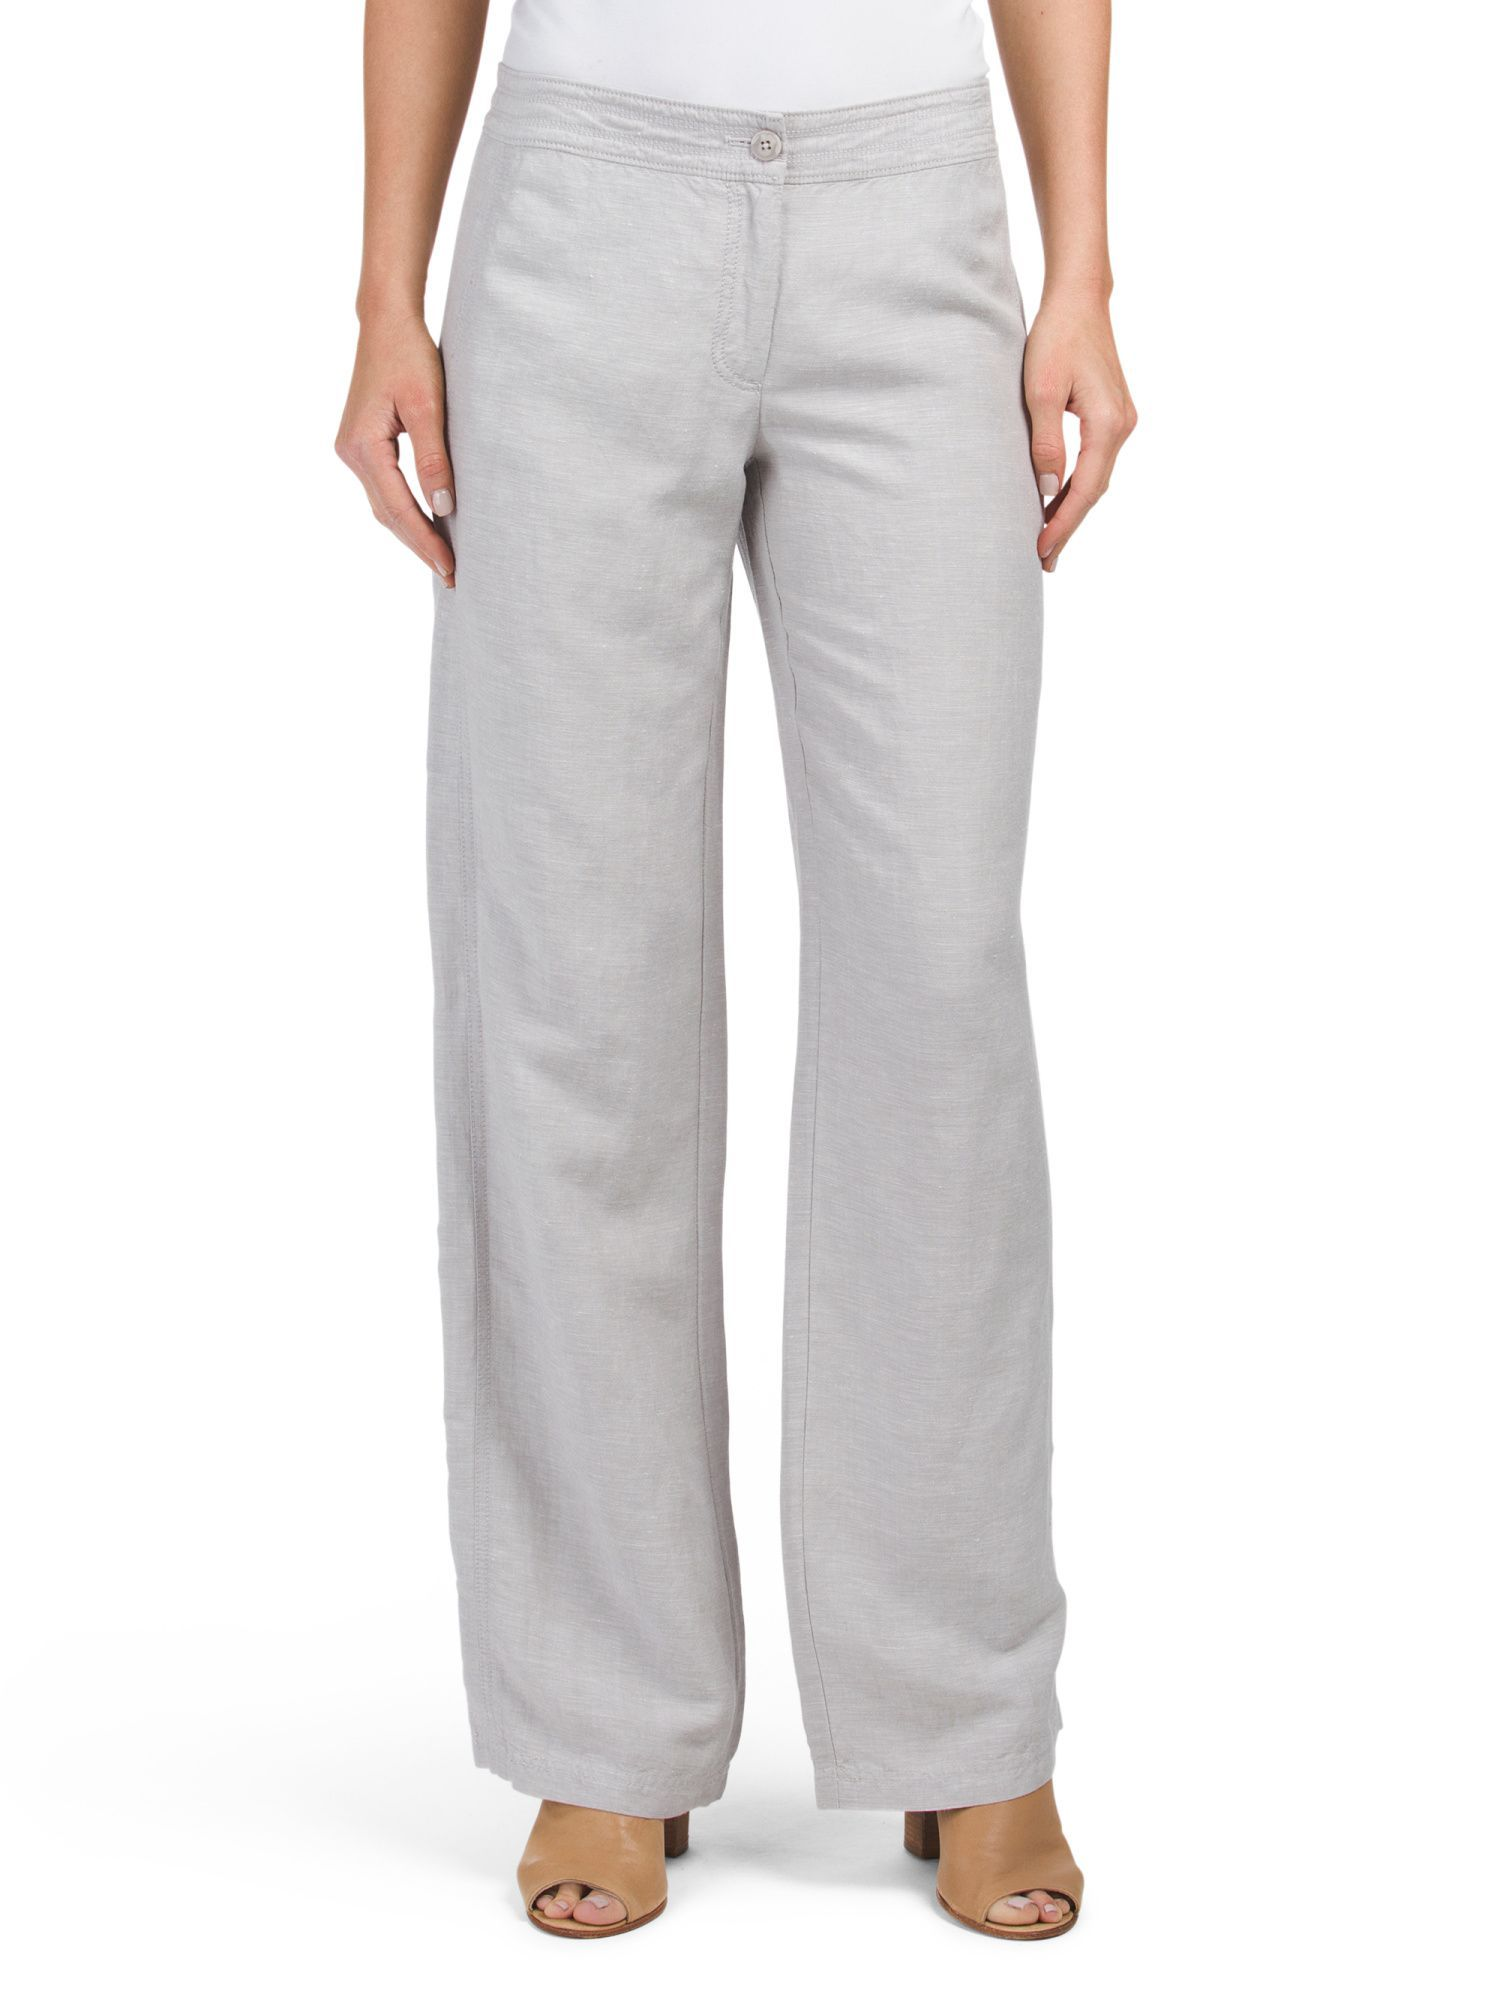 Cool Breeze Linen Pants